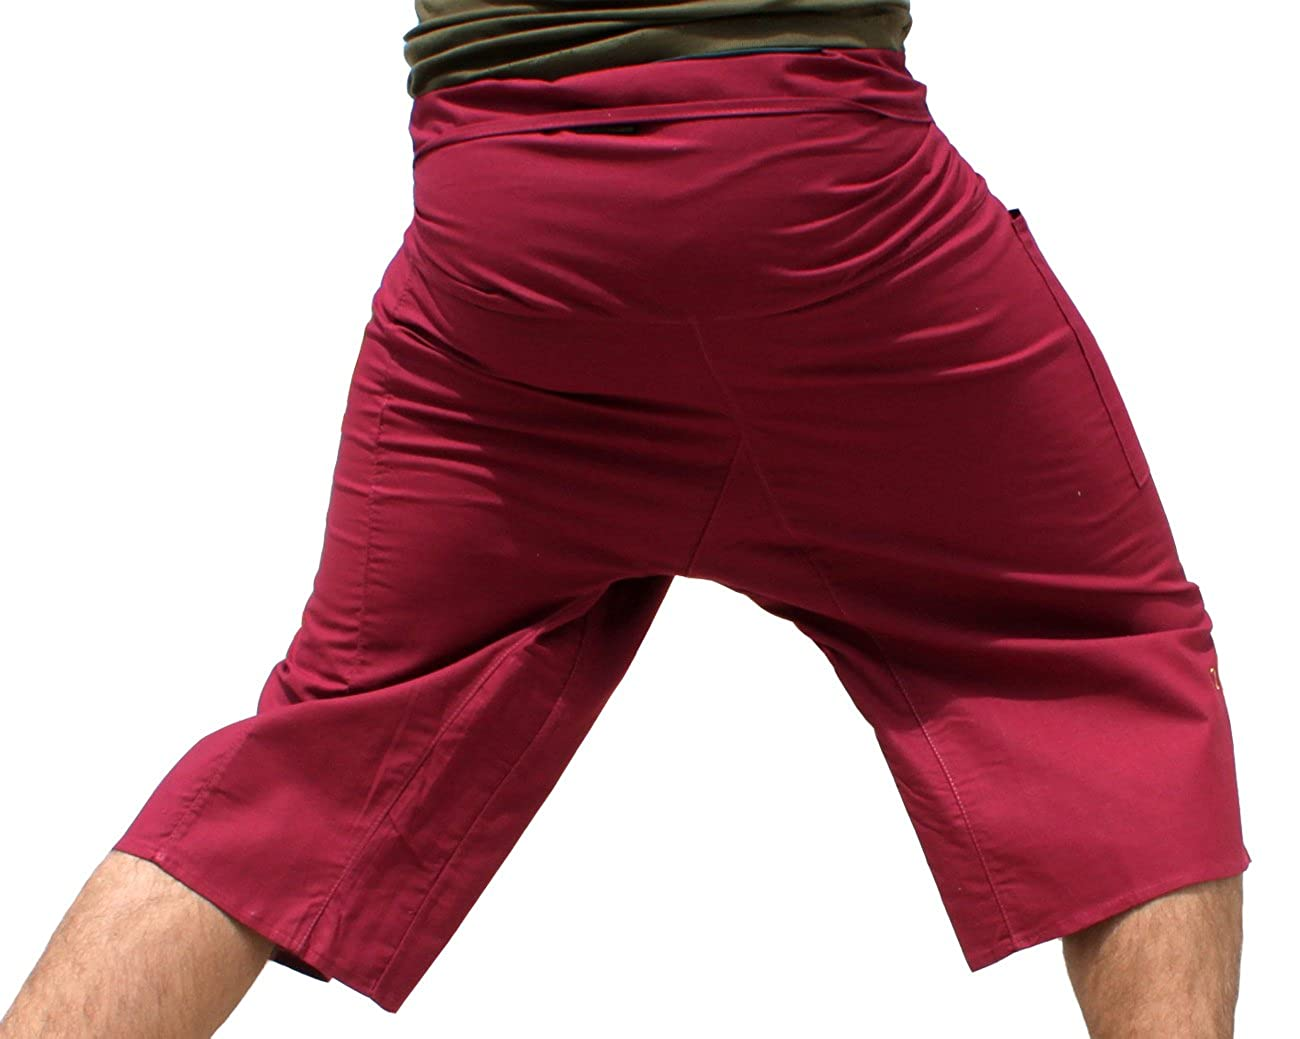 Raan Pah Muang Plain Thin Strong Cotton Thai Fisherman Capri Wrap Pants variant16240AMZ